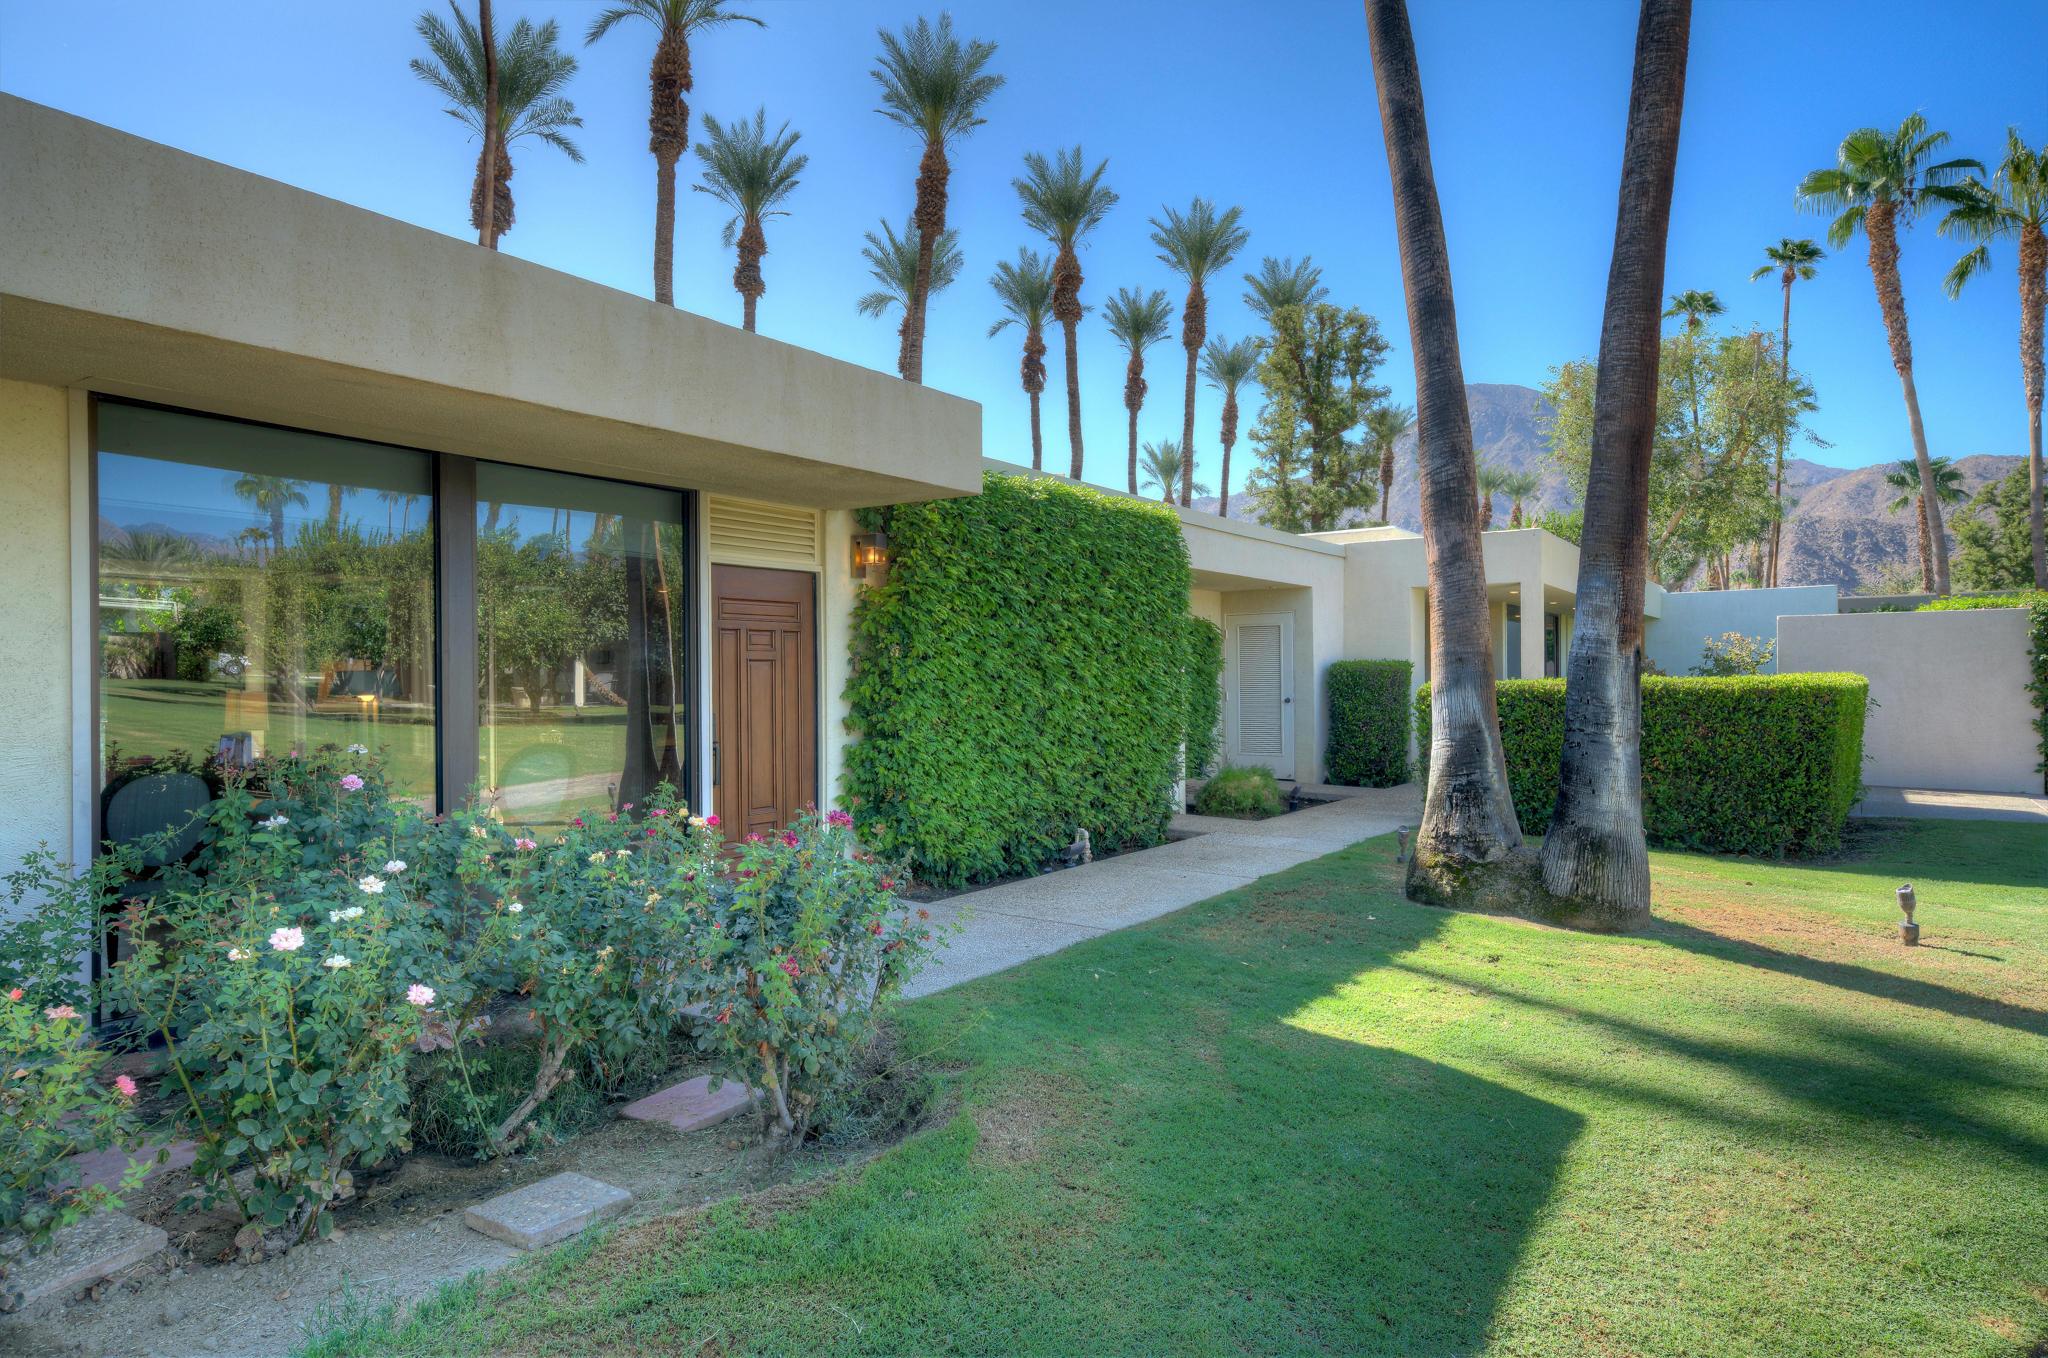 Photo of 46000 W Eldorado Drive #38, Indian Wells, CA 92210